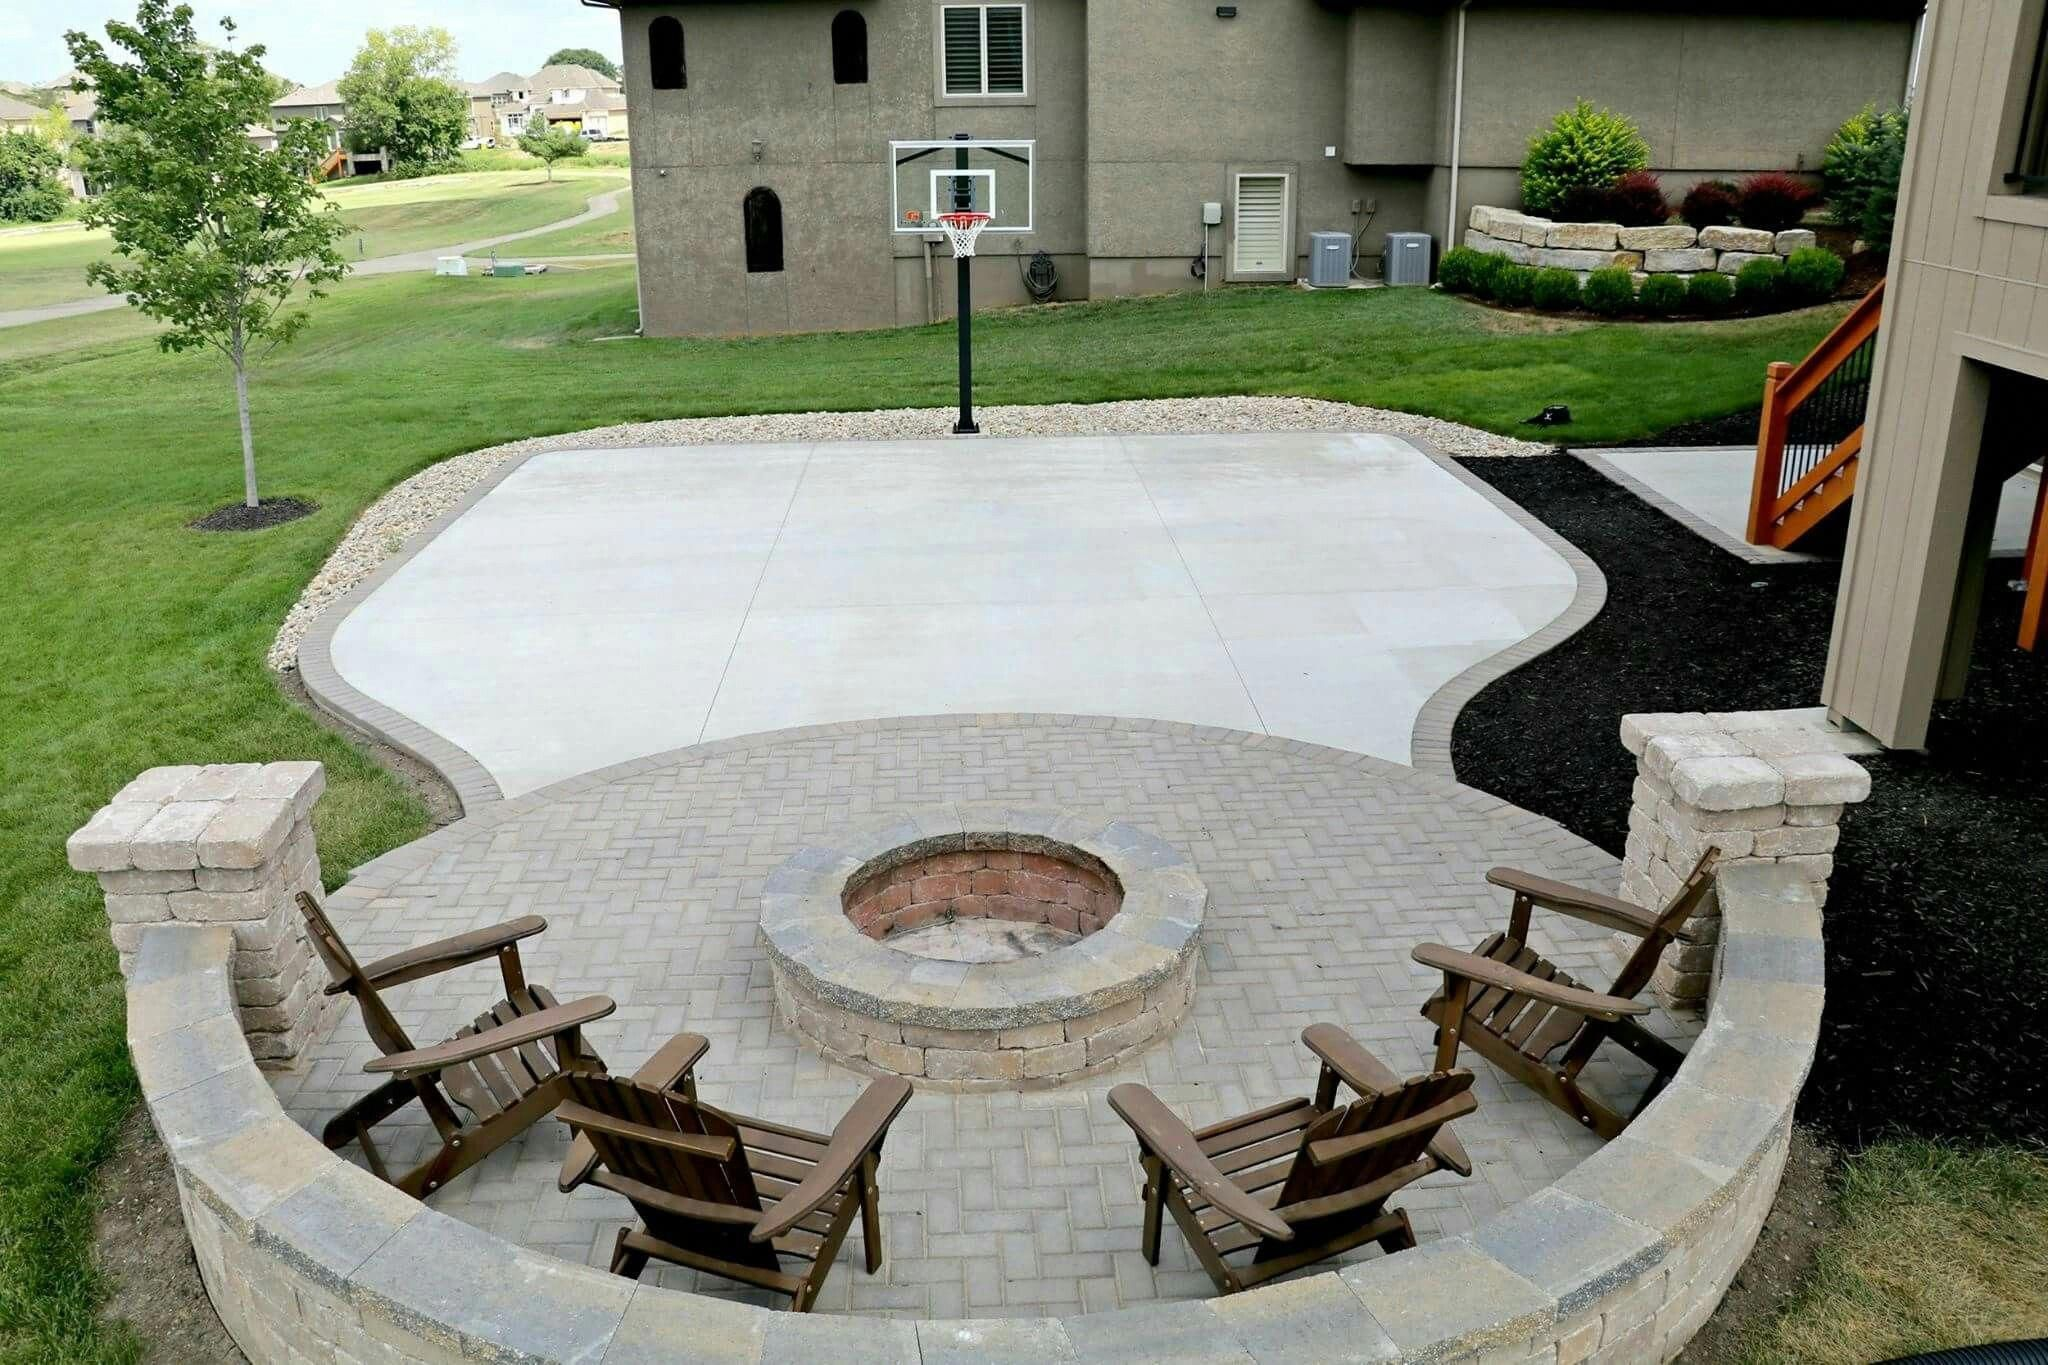 Outdoor decor ideas | Basketball court backyard, Backyard ...